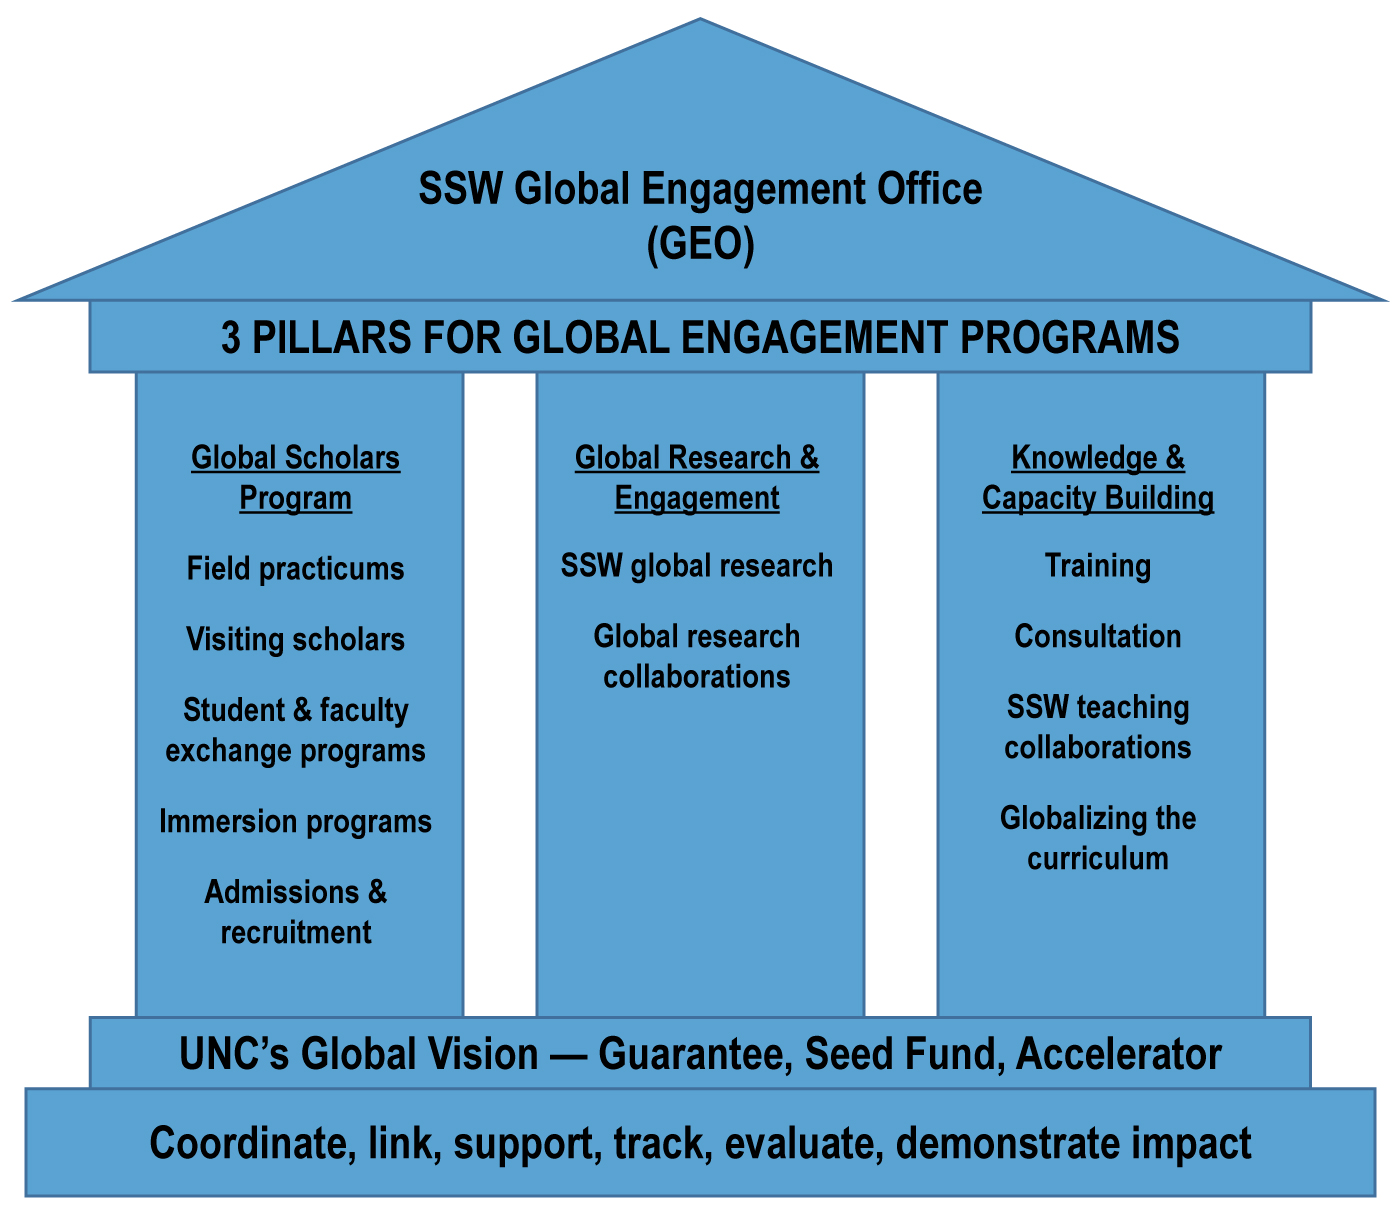 Global Engagement Programs Pillars